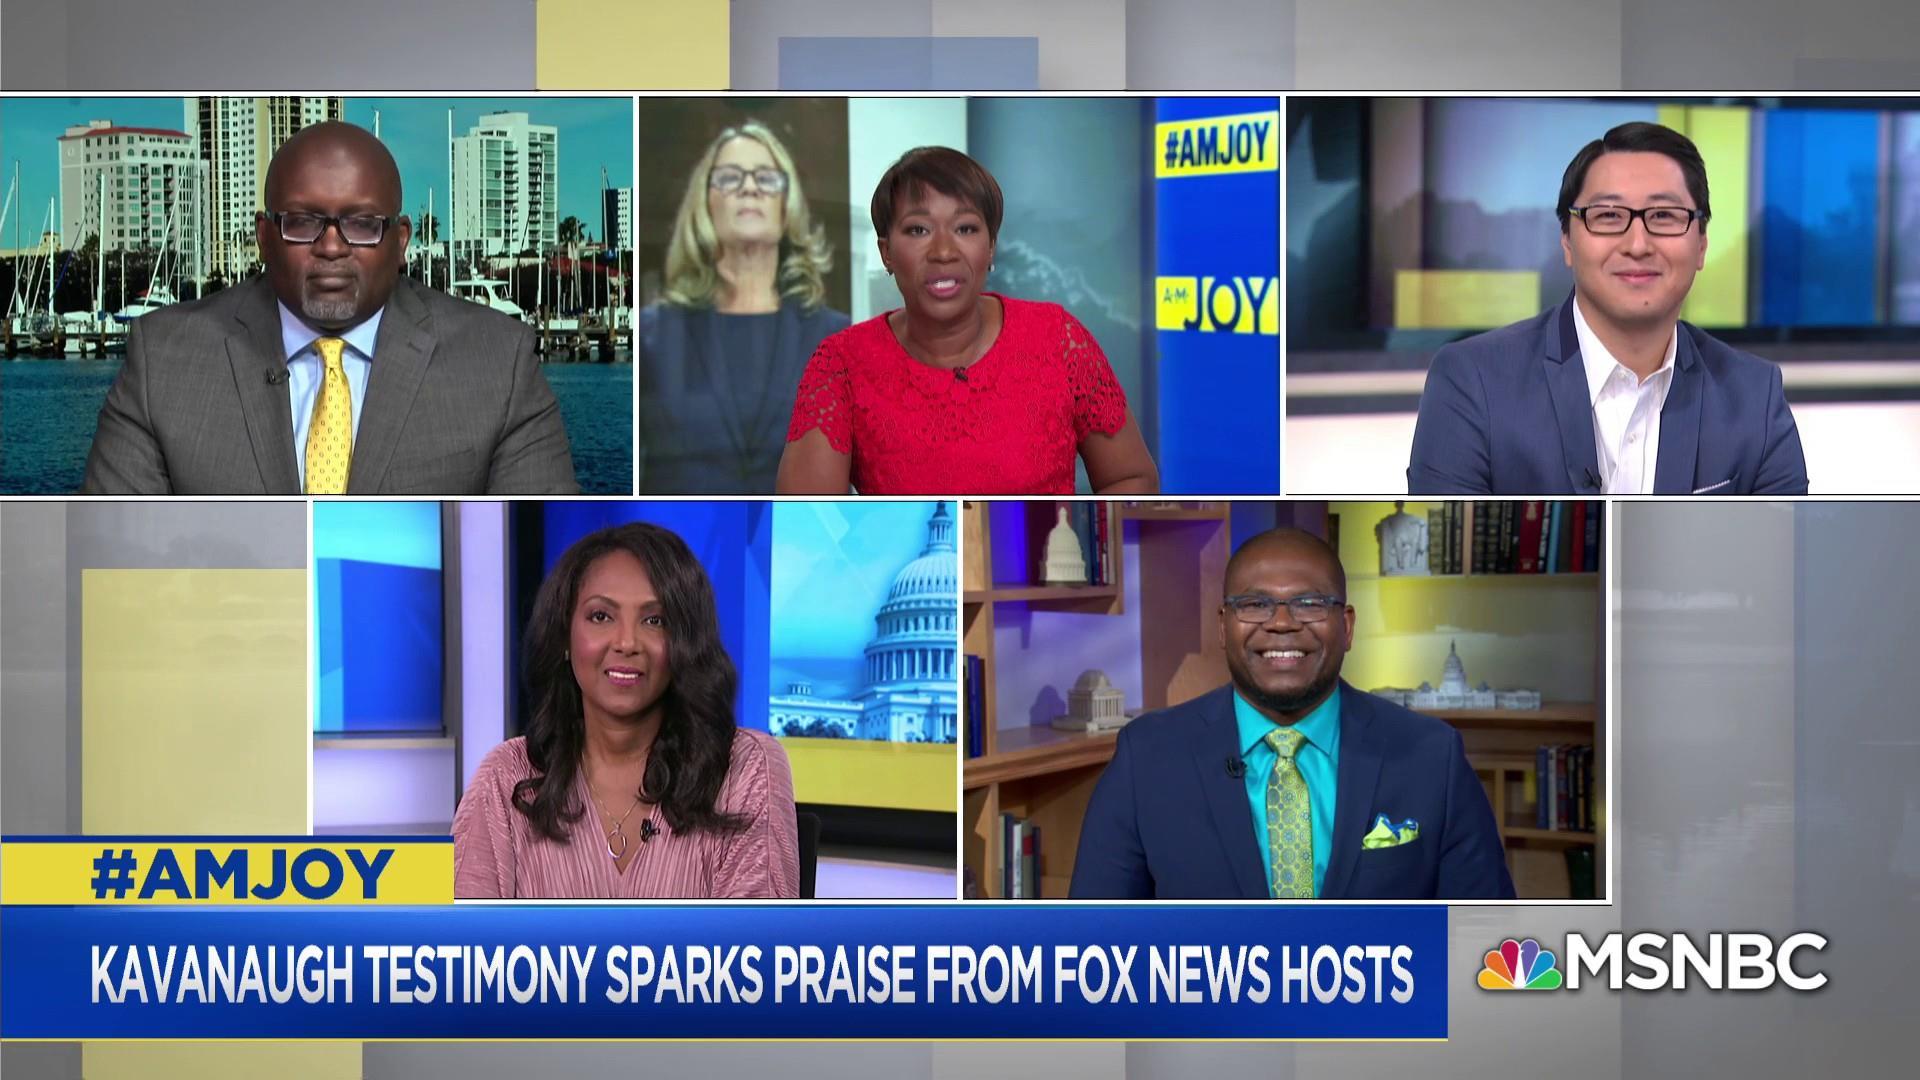 FOX News Praises Kavanaugh's Testimony